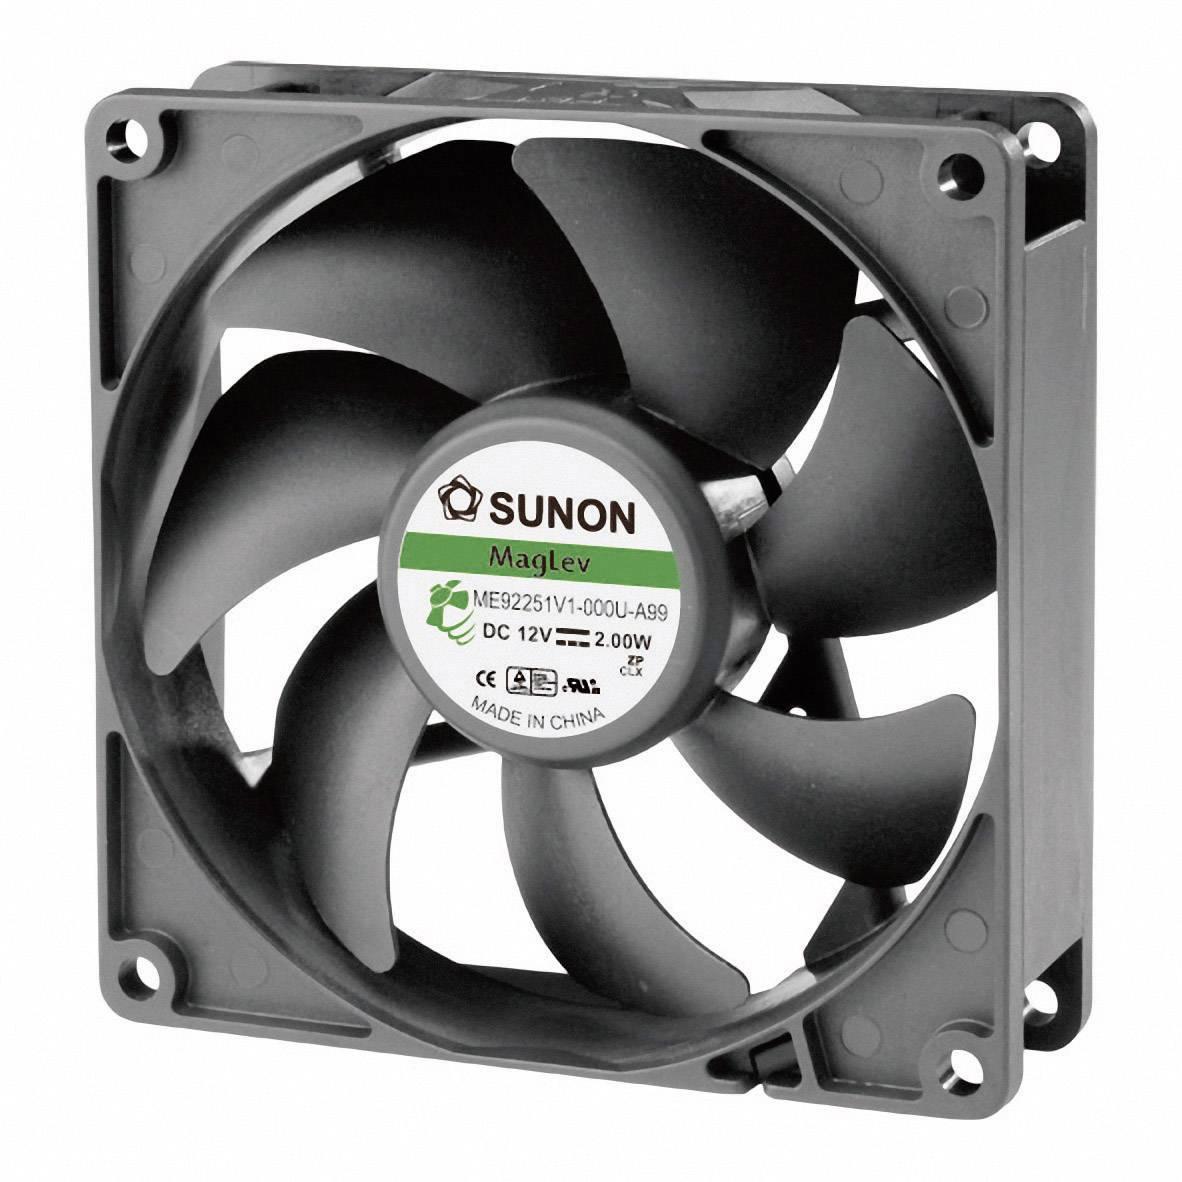 Ventilátor Sunon DR ME92251V1-000U-A99, 92 x 92 x 25 mm, 12V/DC